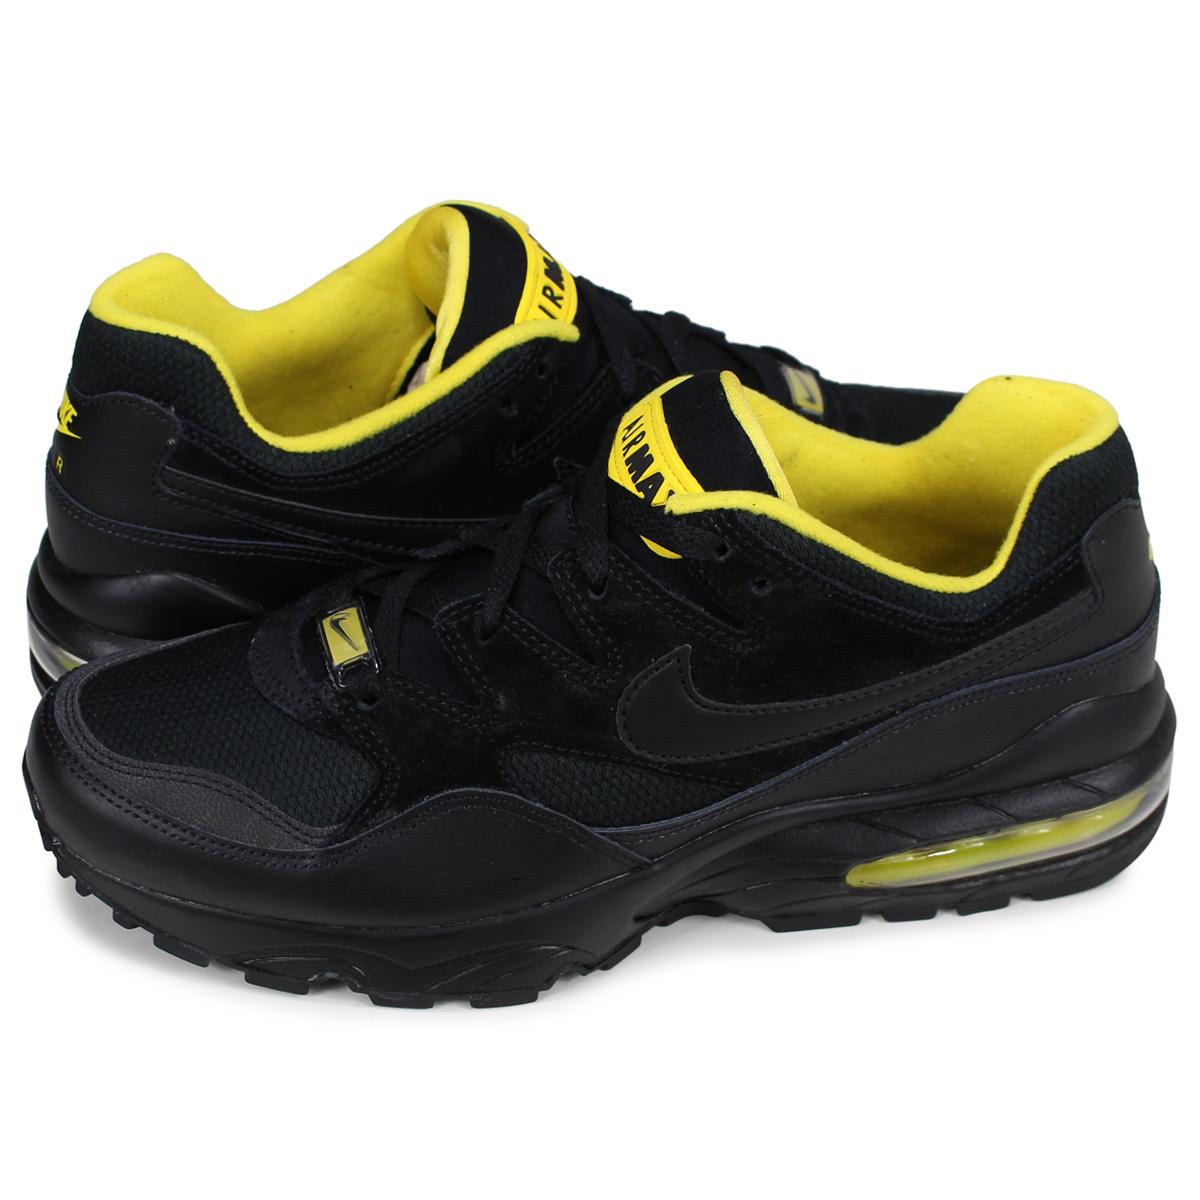 new product 8a2eb e7551 Nike NIKE Air Max 94 sneakers men AIR MAX 94 black black AV8197-002 [197]